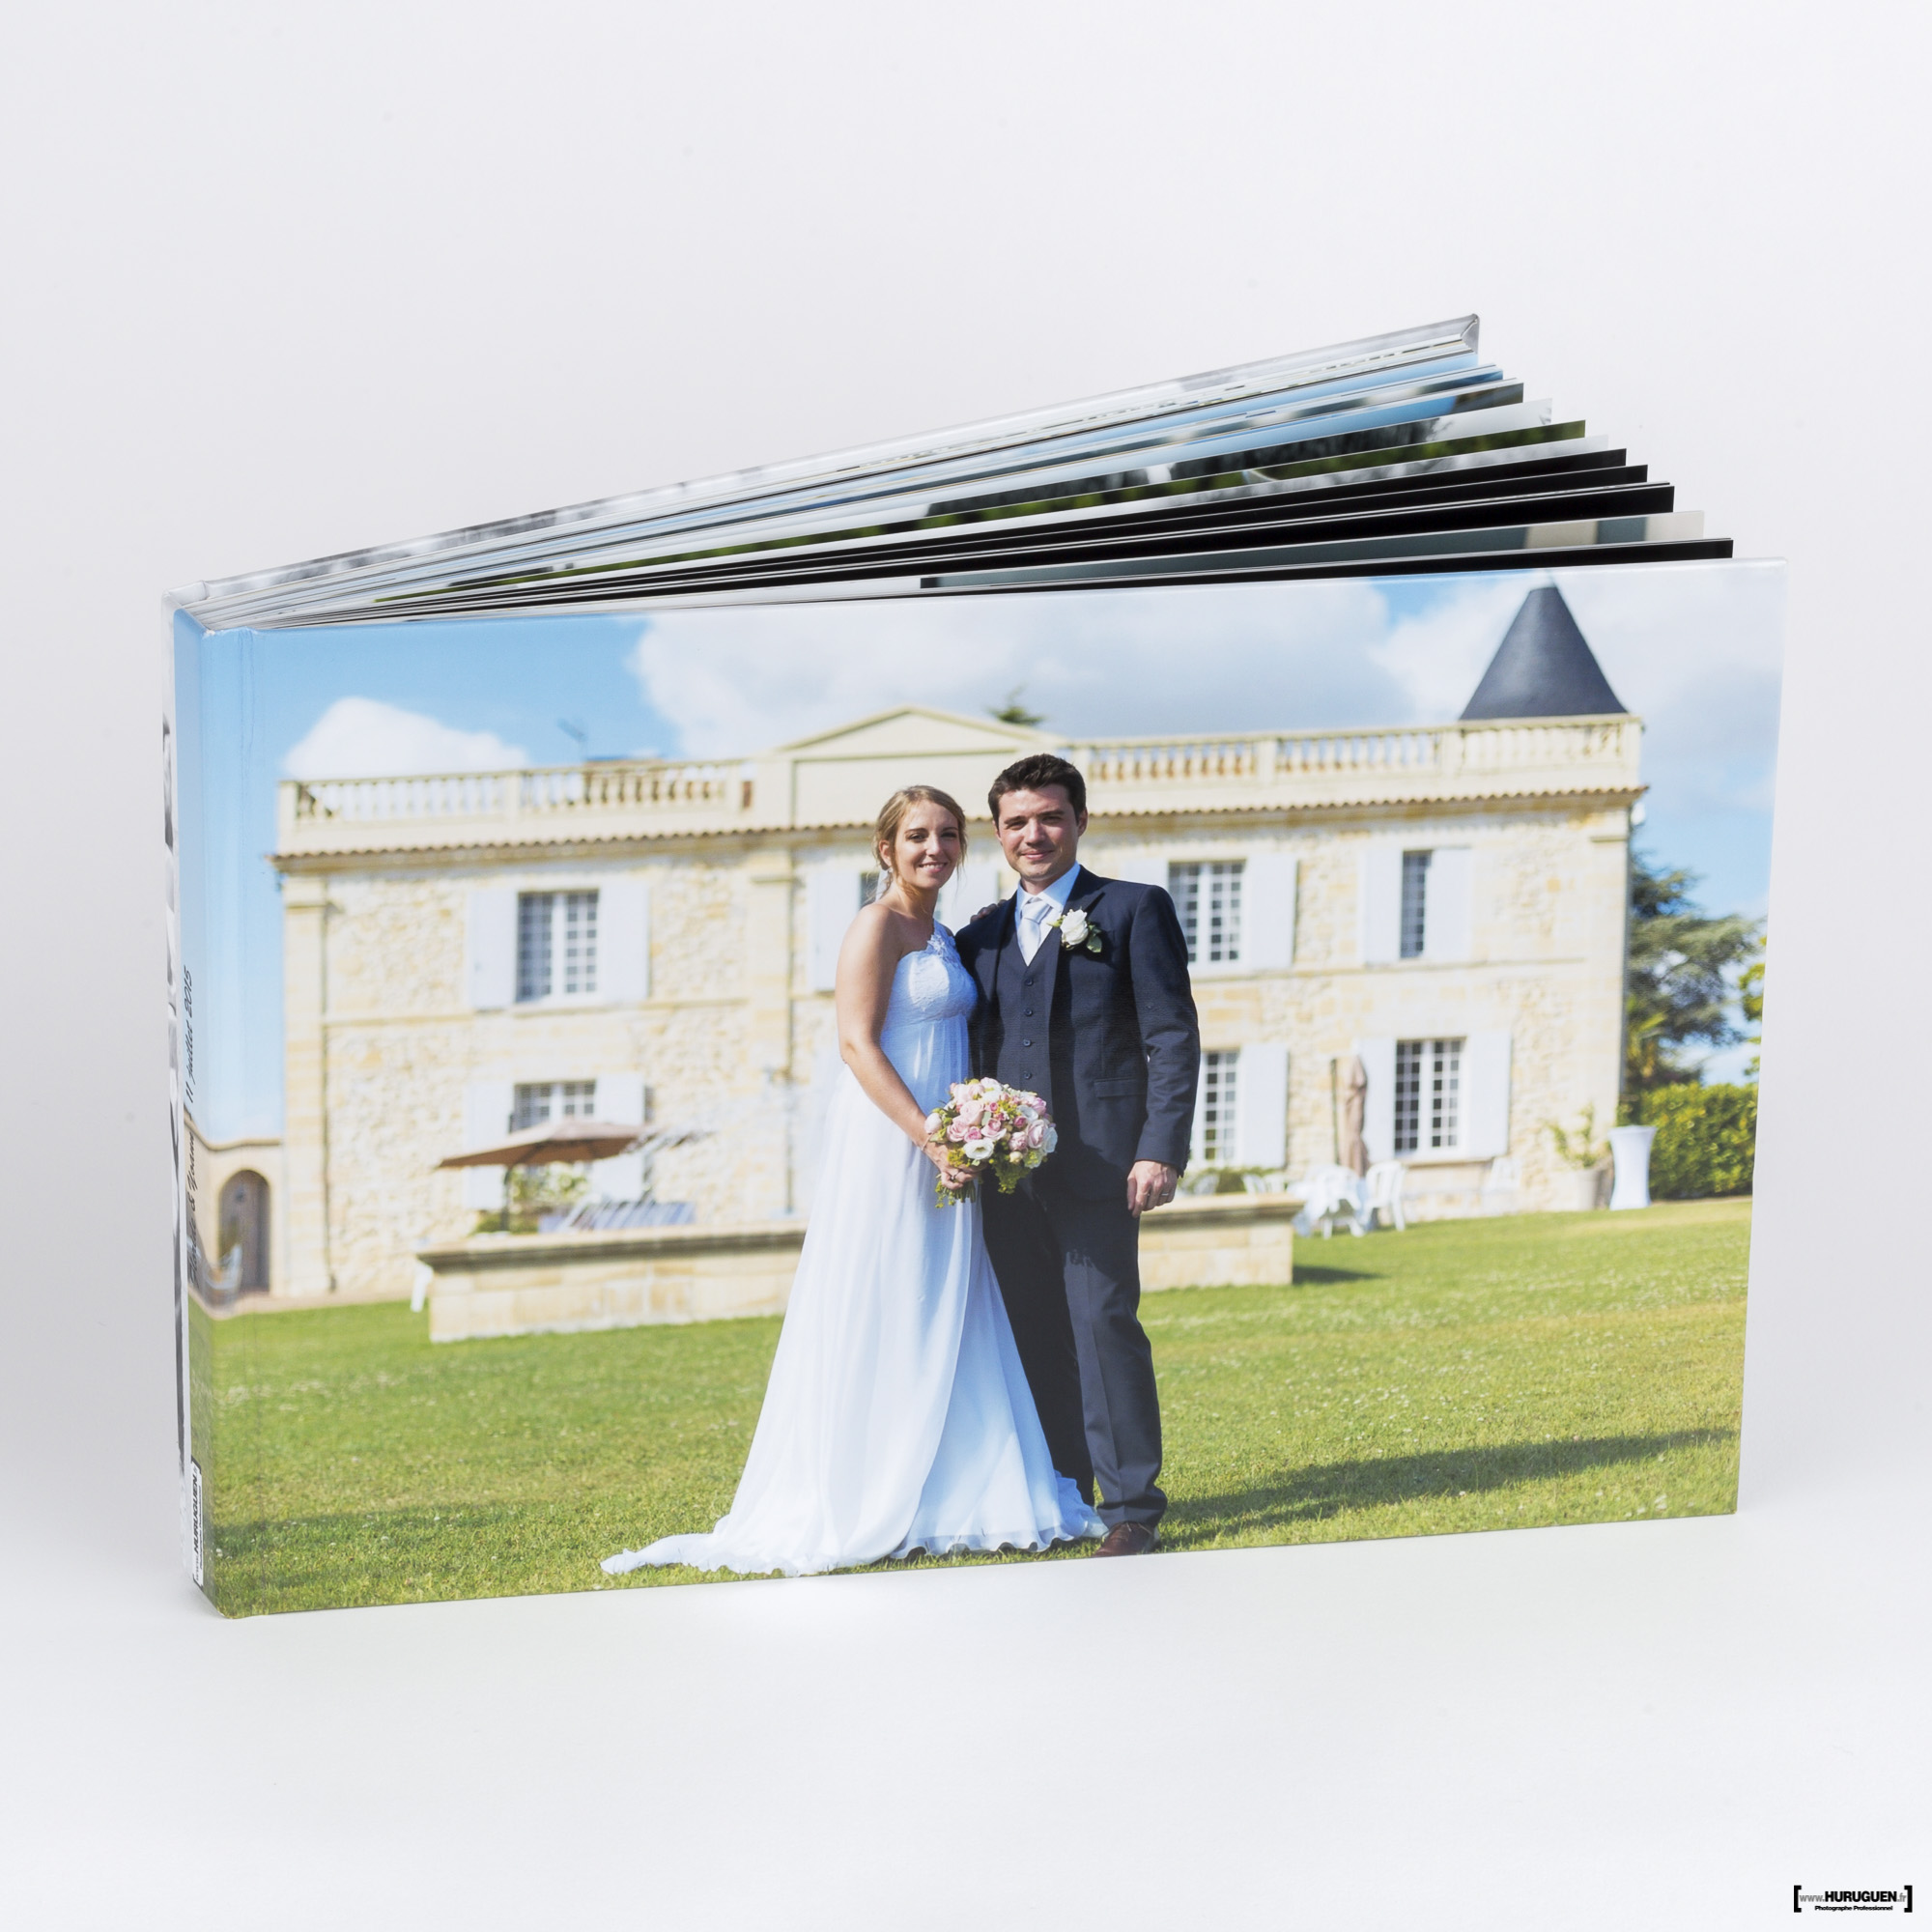 tarifs album photo mariage bordeaux sebastien huruguensebastien huruguen photographe de. Black Bedroom Furniture Sets. Home Design Ideas